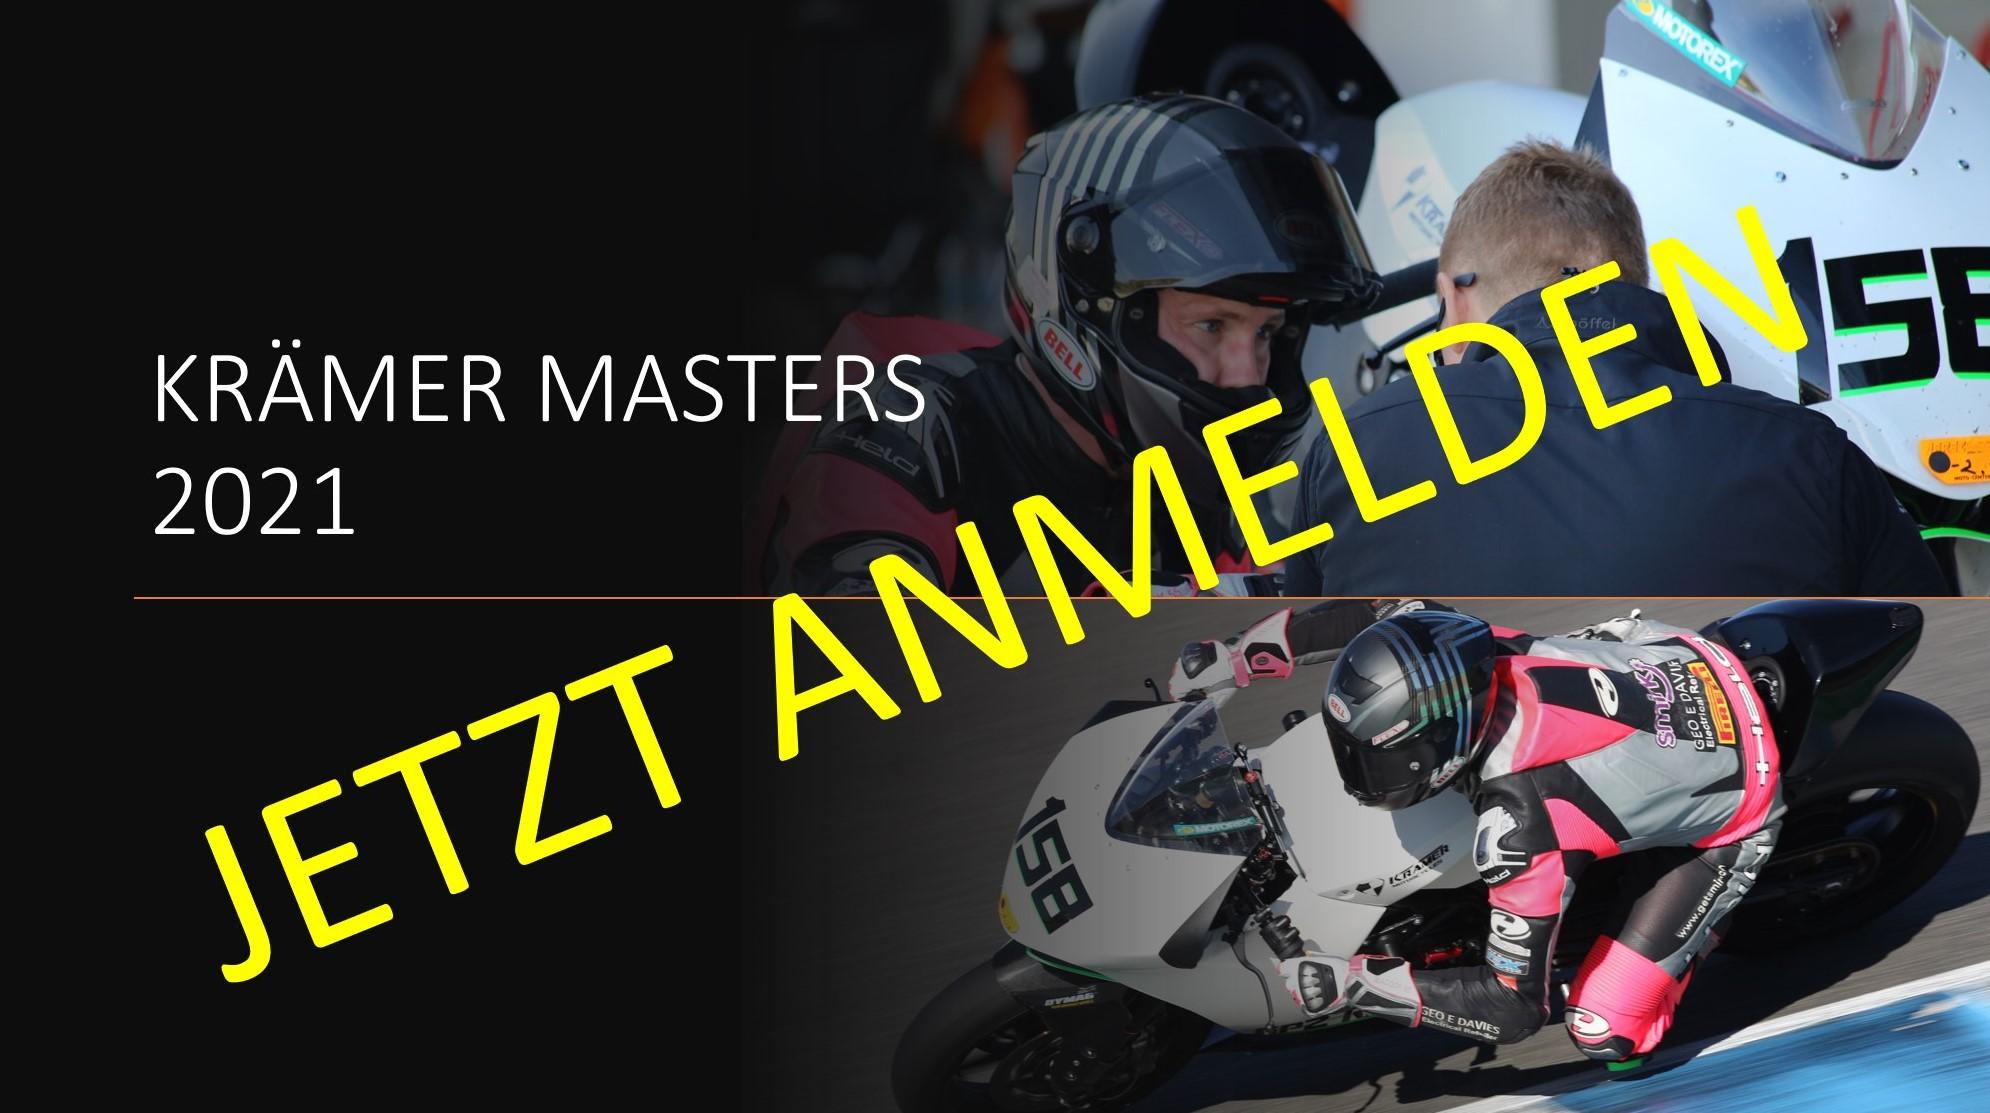 Krämer Masters 2021